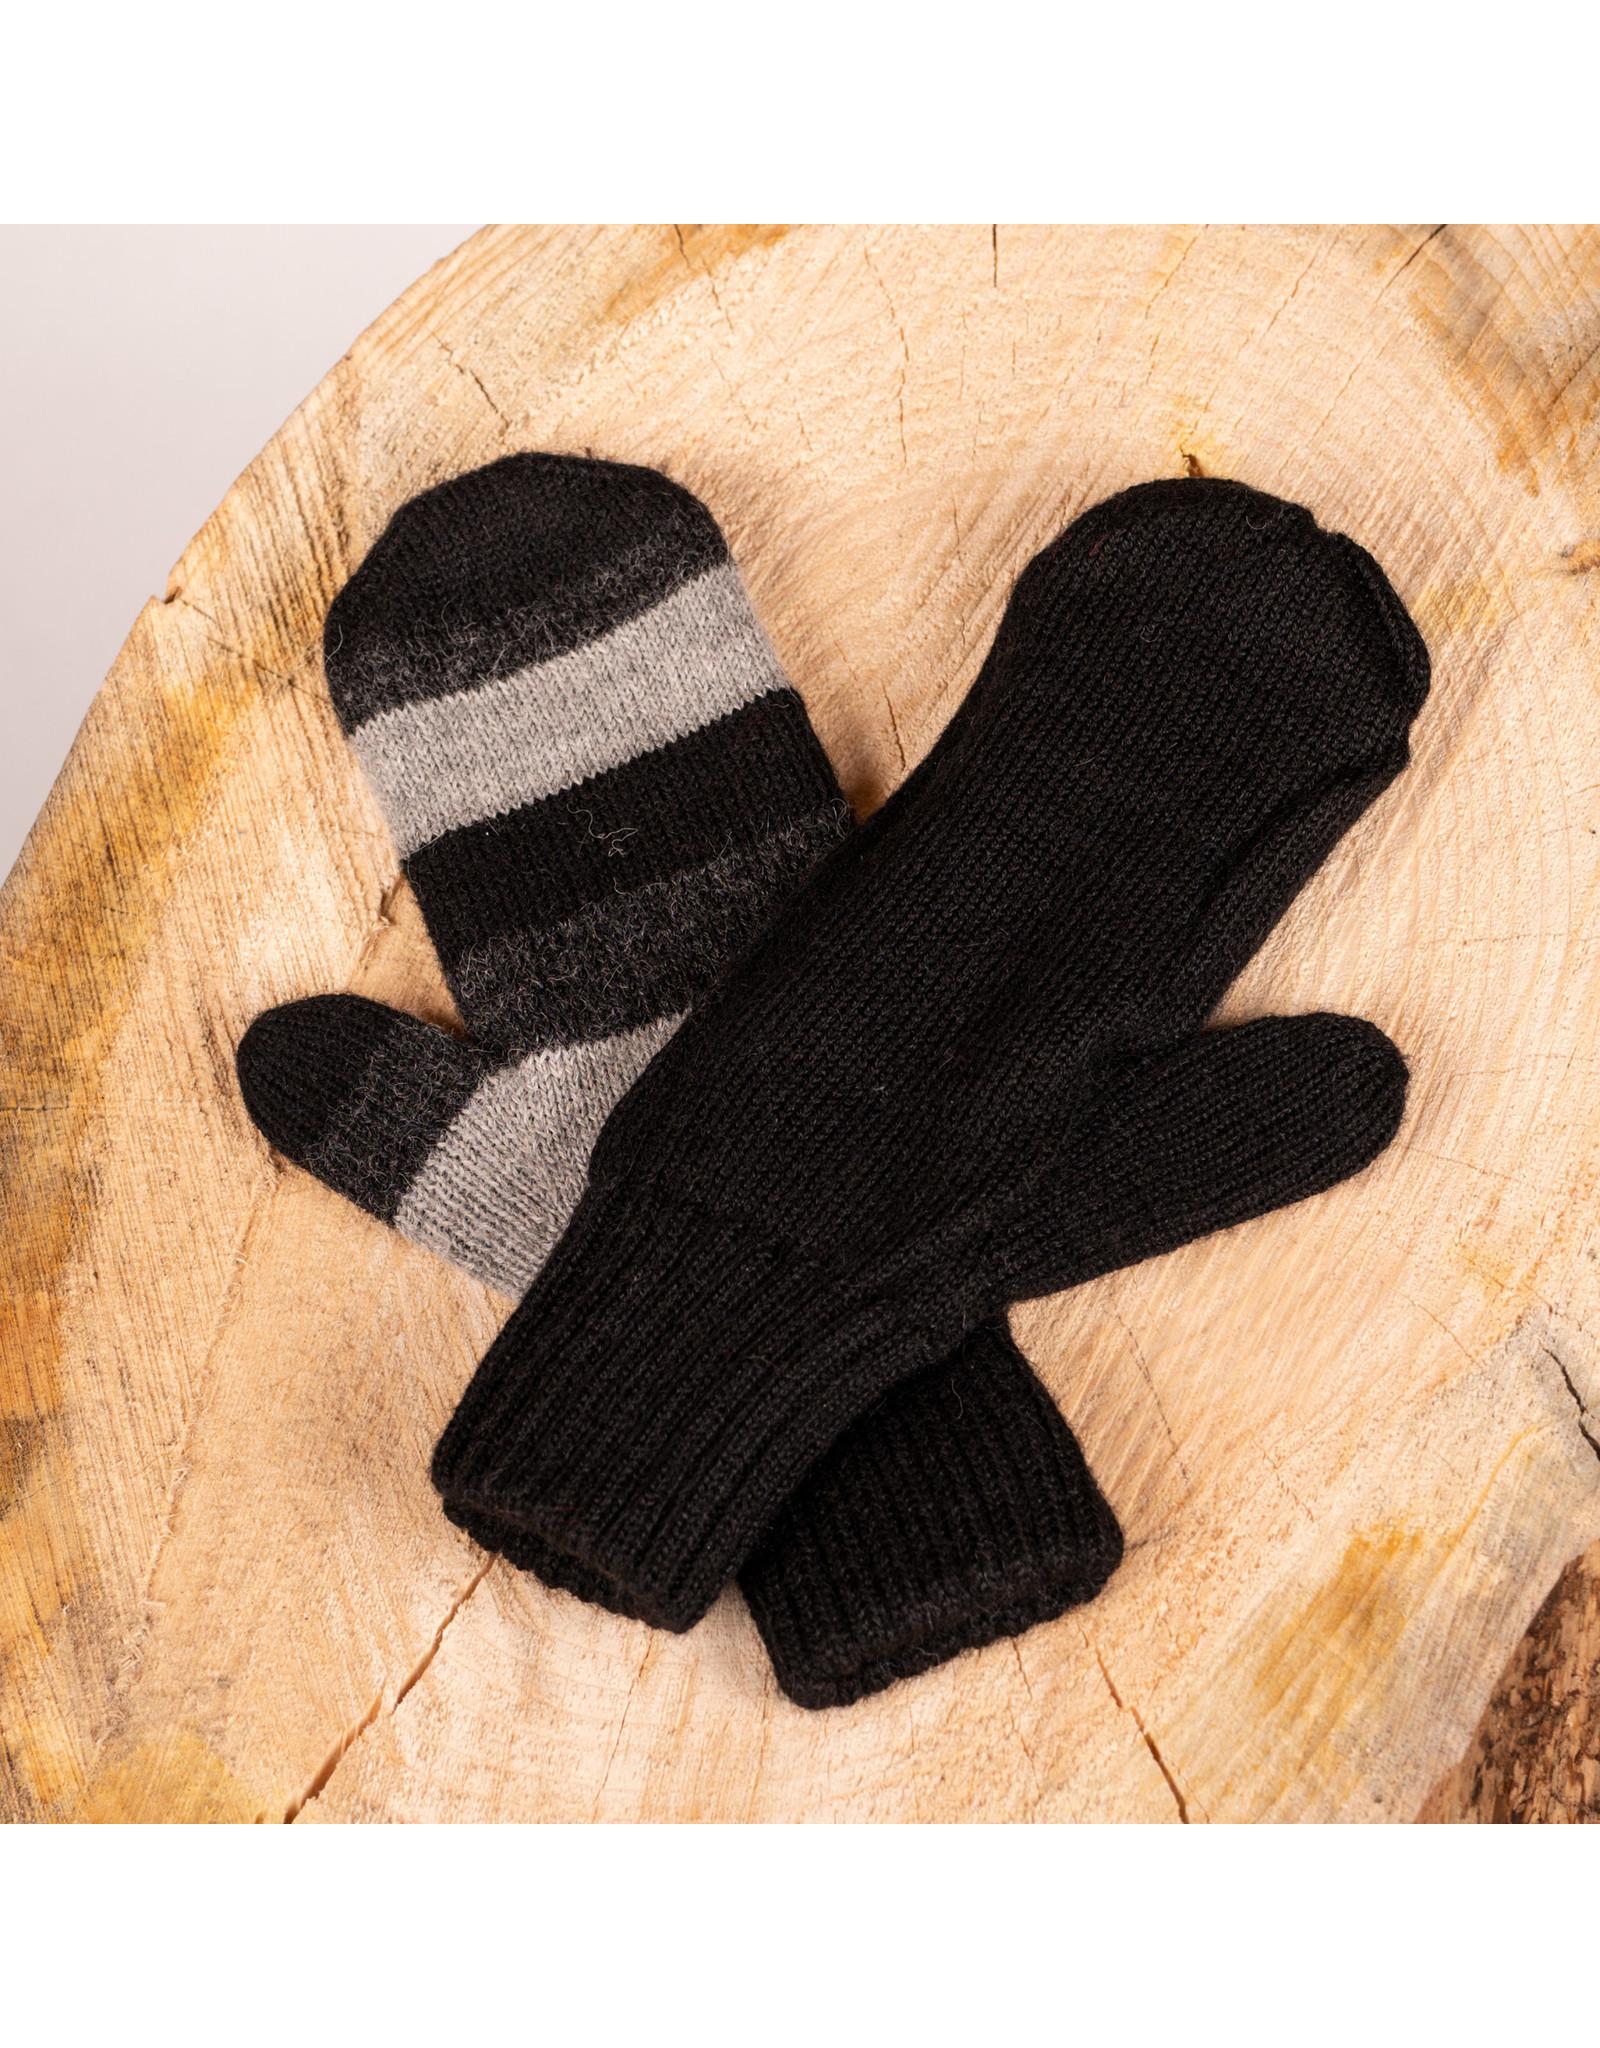 Alpaca DNA Double and reversible Black Distinction mittens 100% Alpaca wool